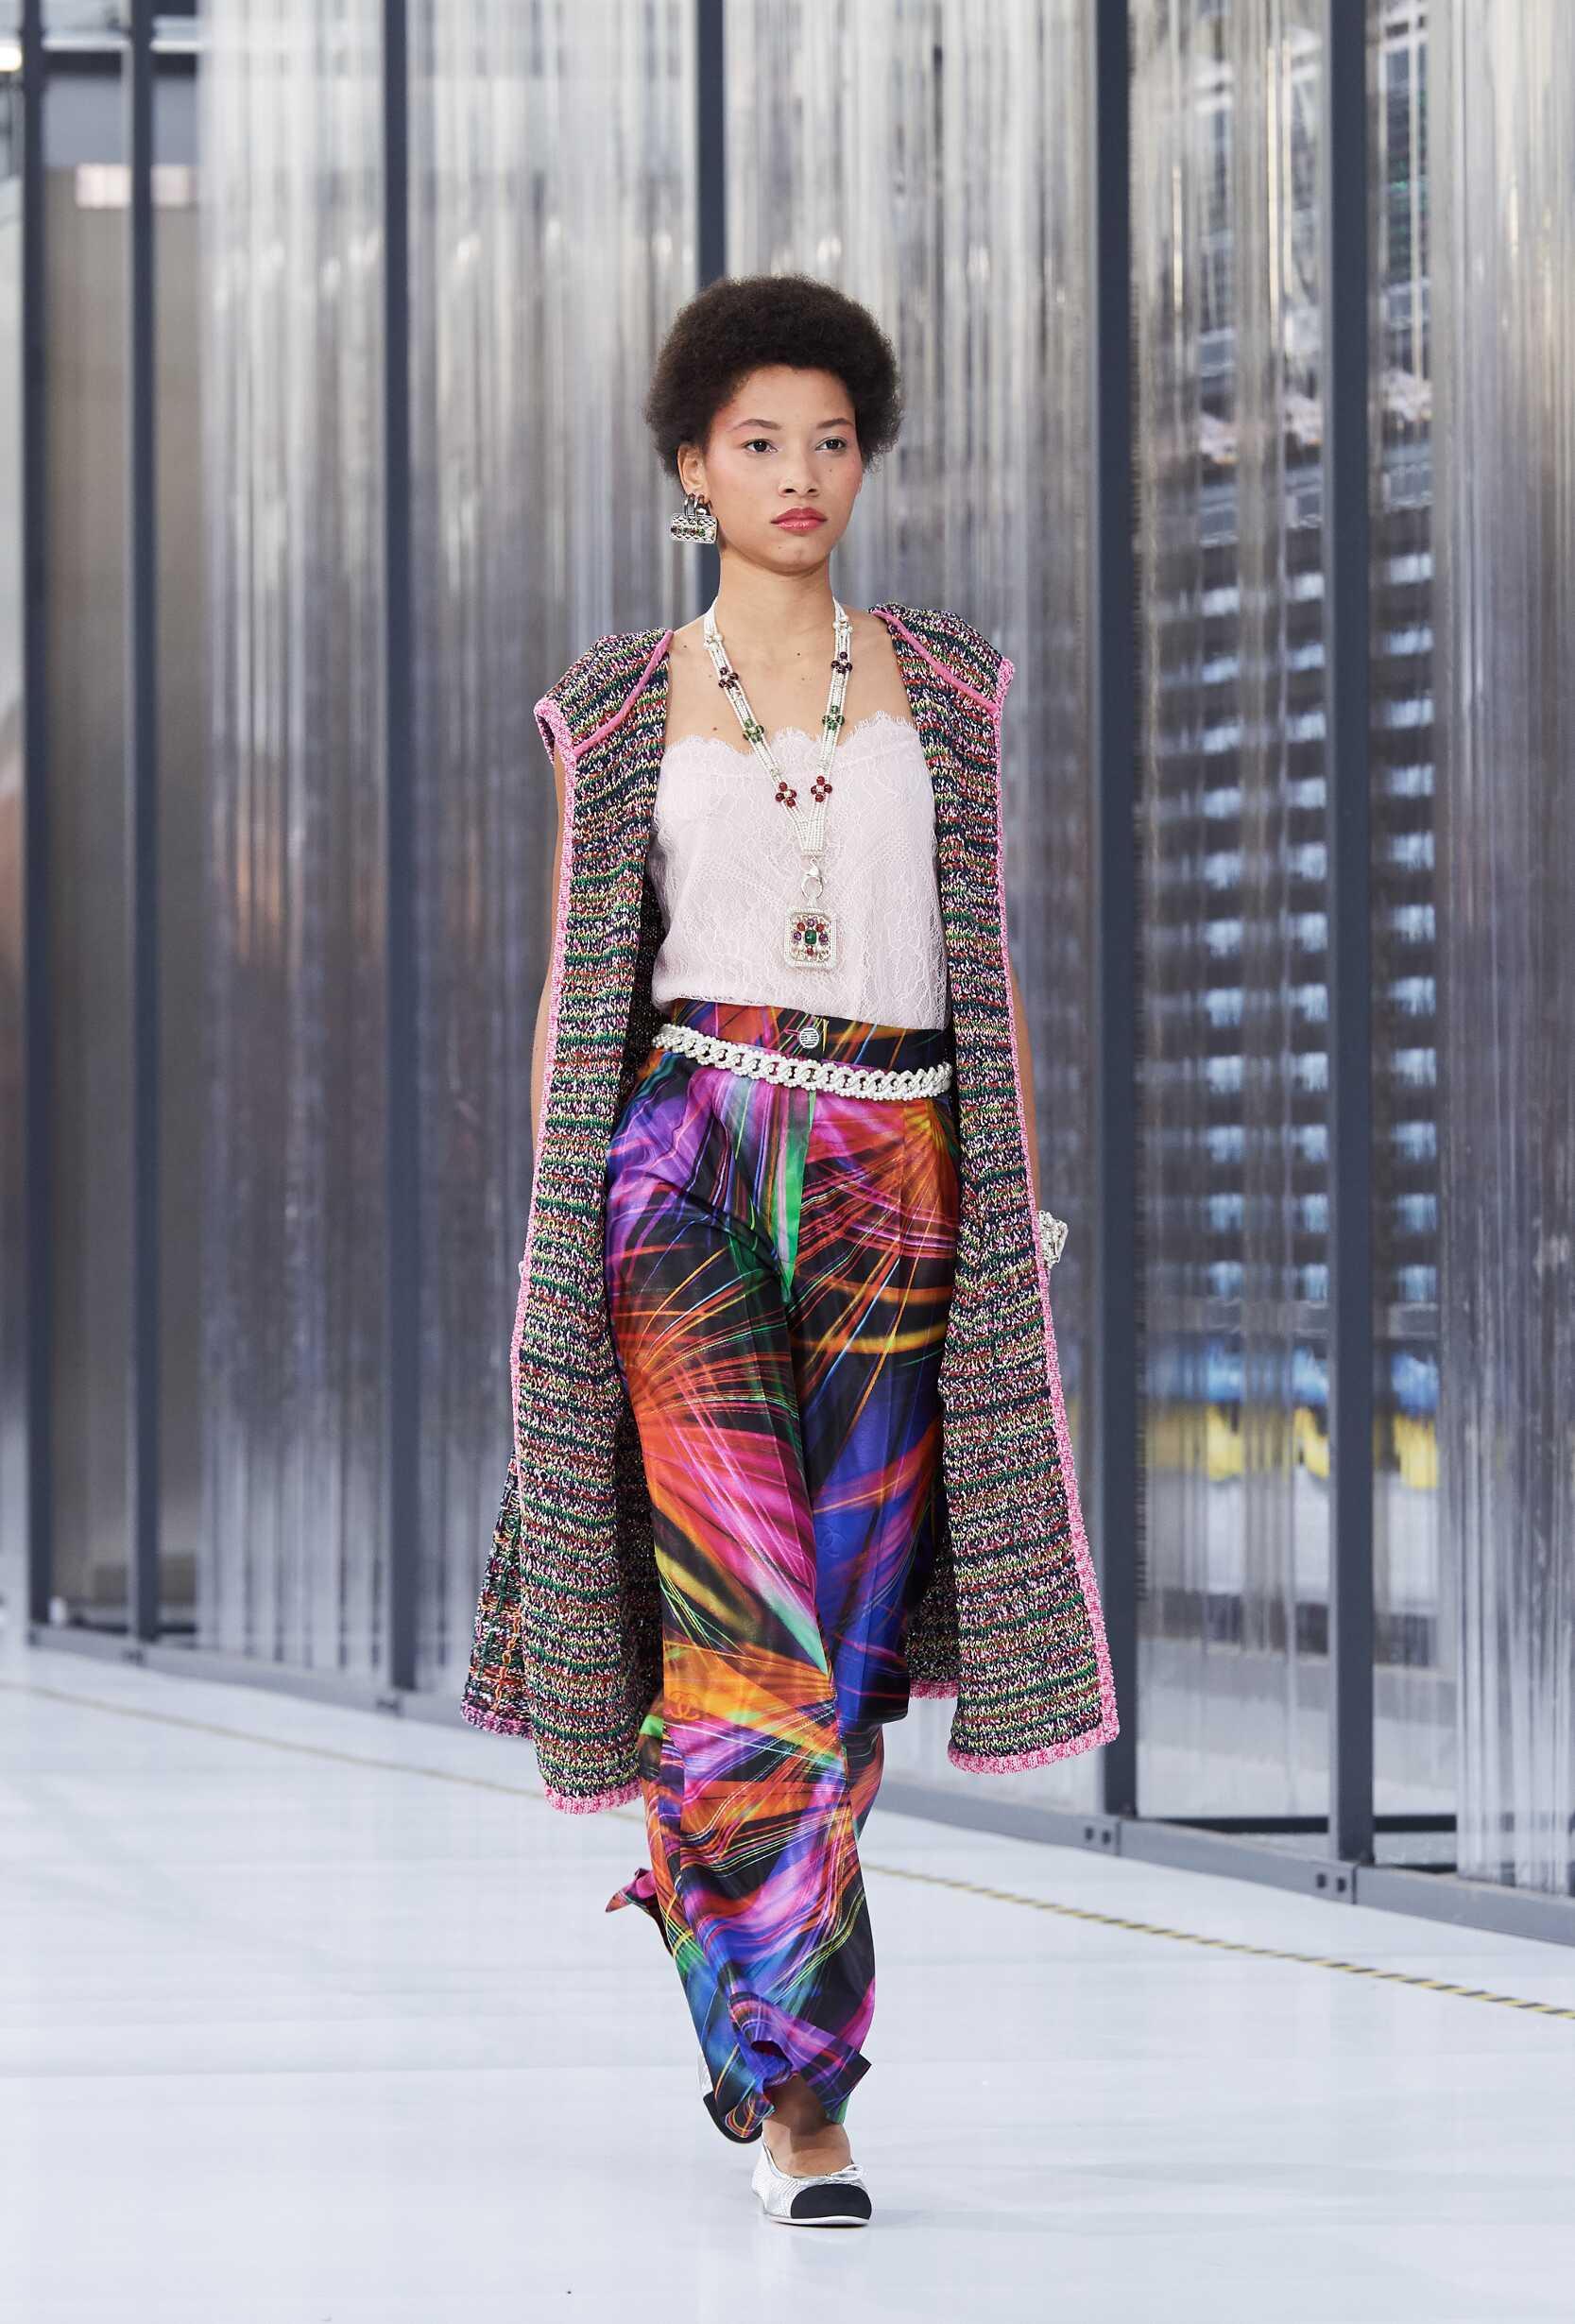 2017 Chanel Catwalk Paris Fashion Week